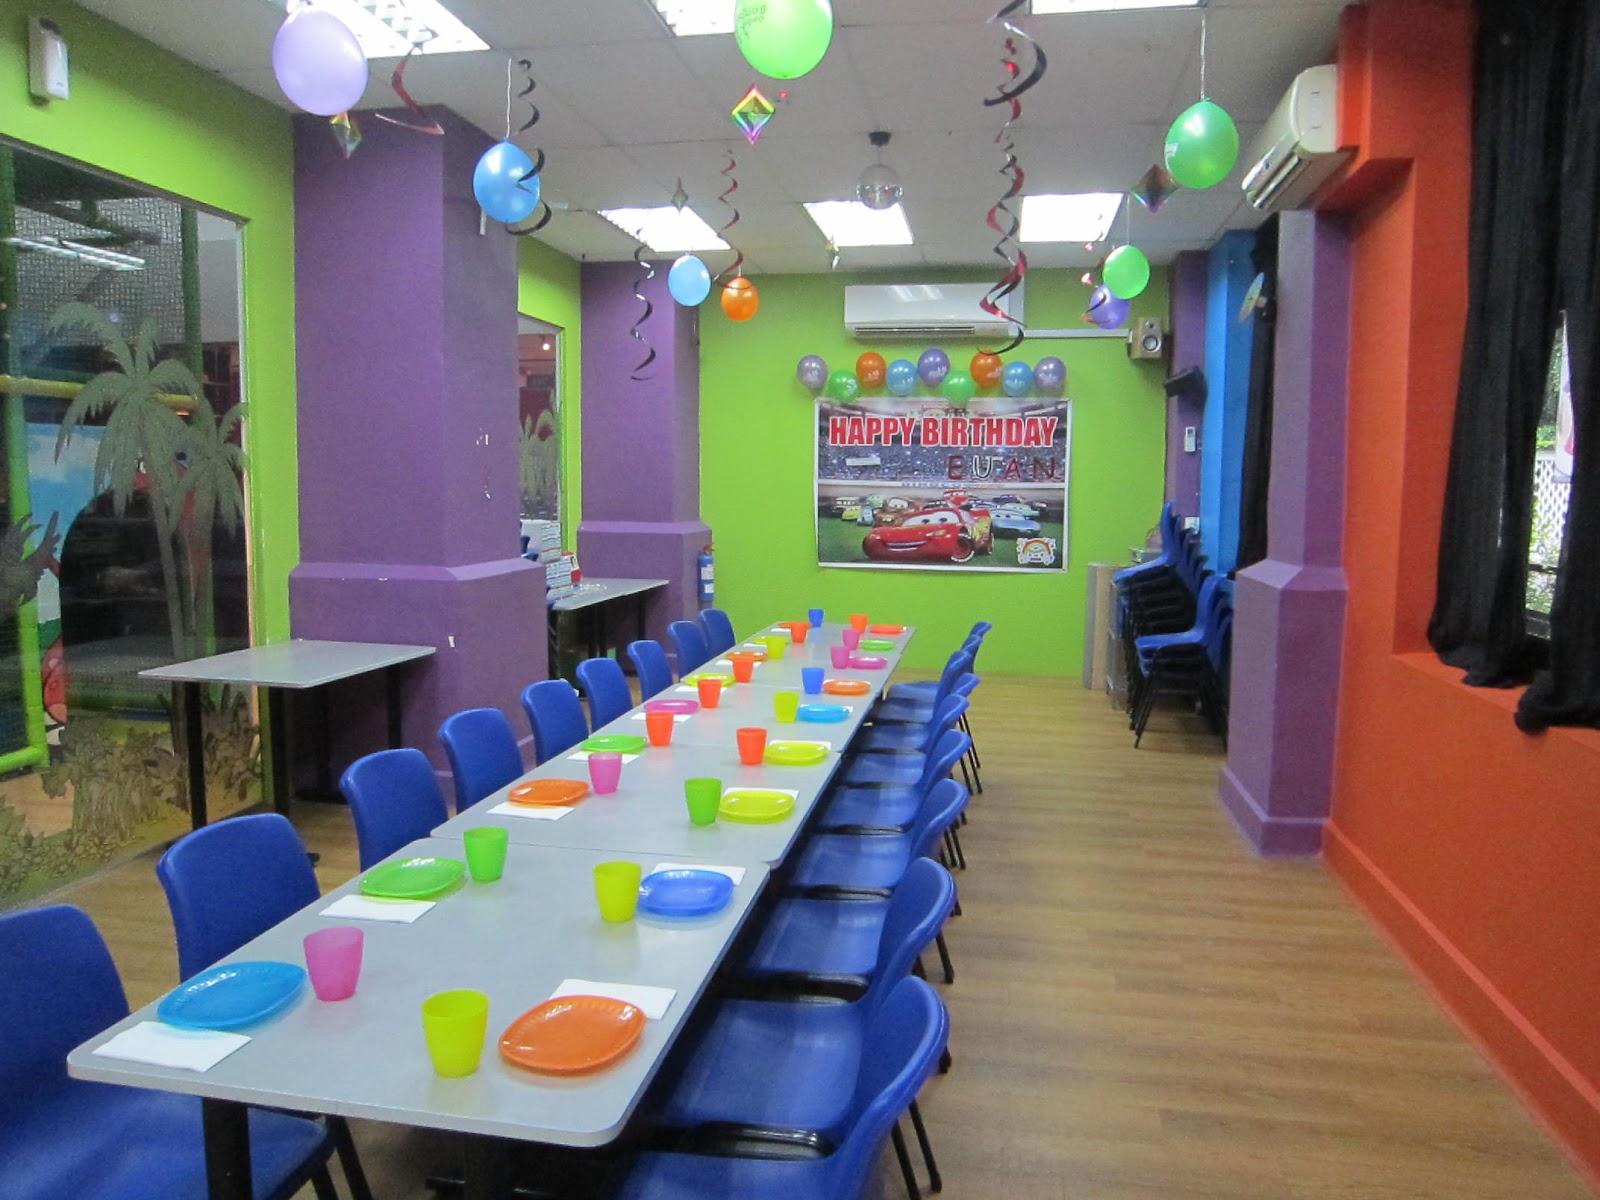 Mr Bottle's Kids Party: BEST INDOOR PLAYGROUNDS 2